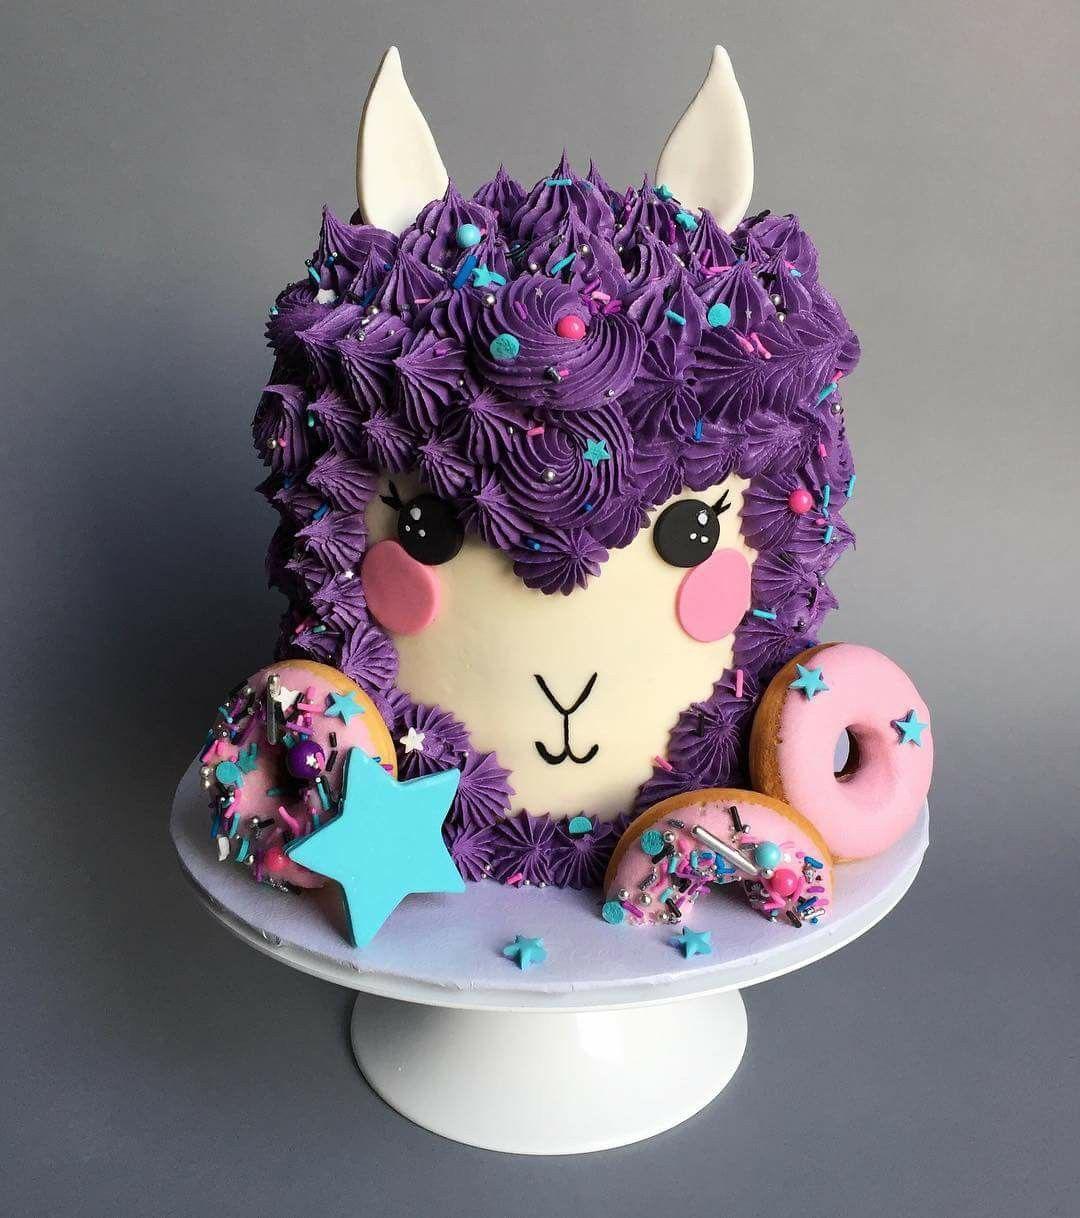 Llama Cake Instead Of Unicorn Cake 12 Cupcakes Sweets